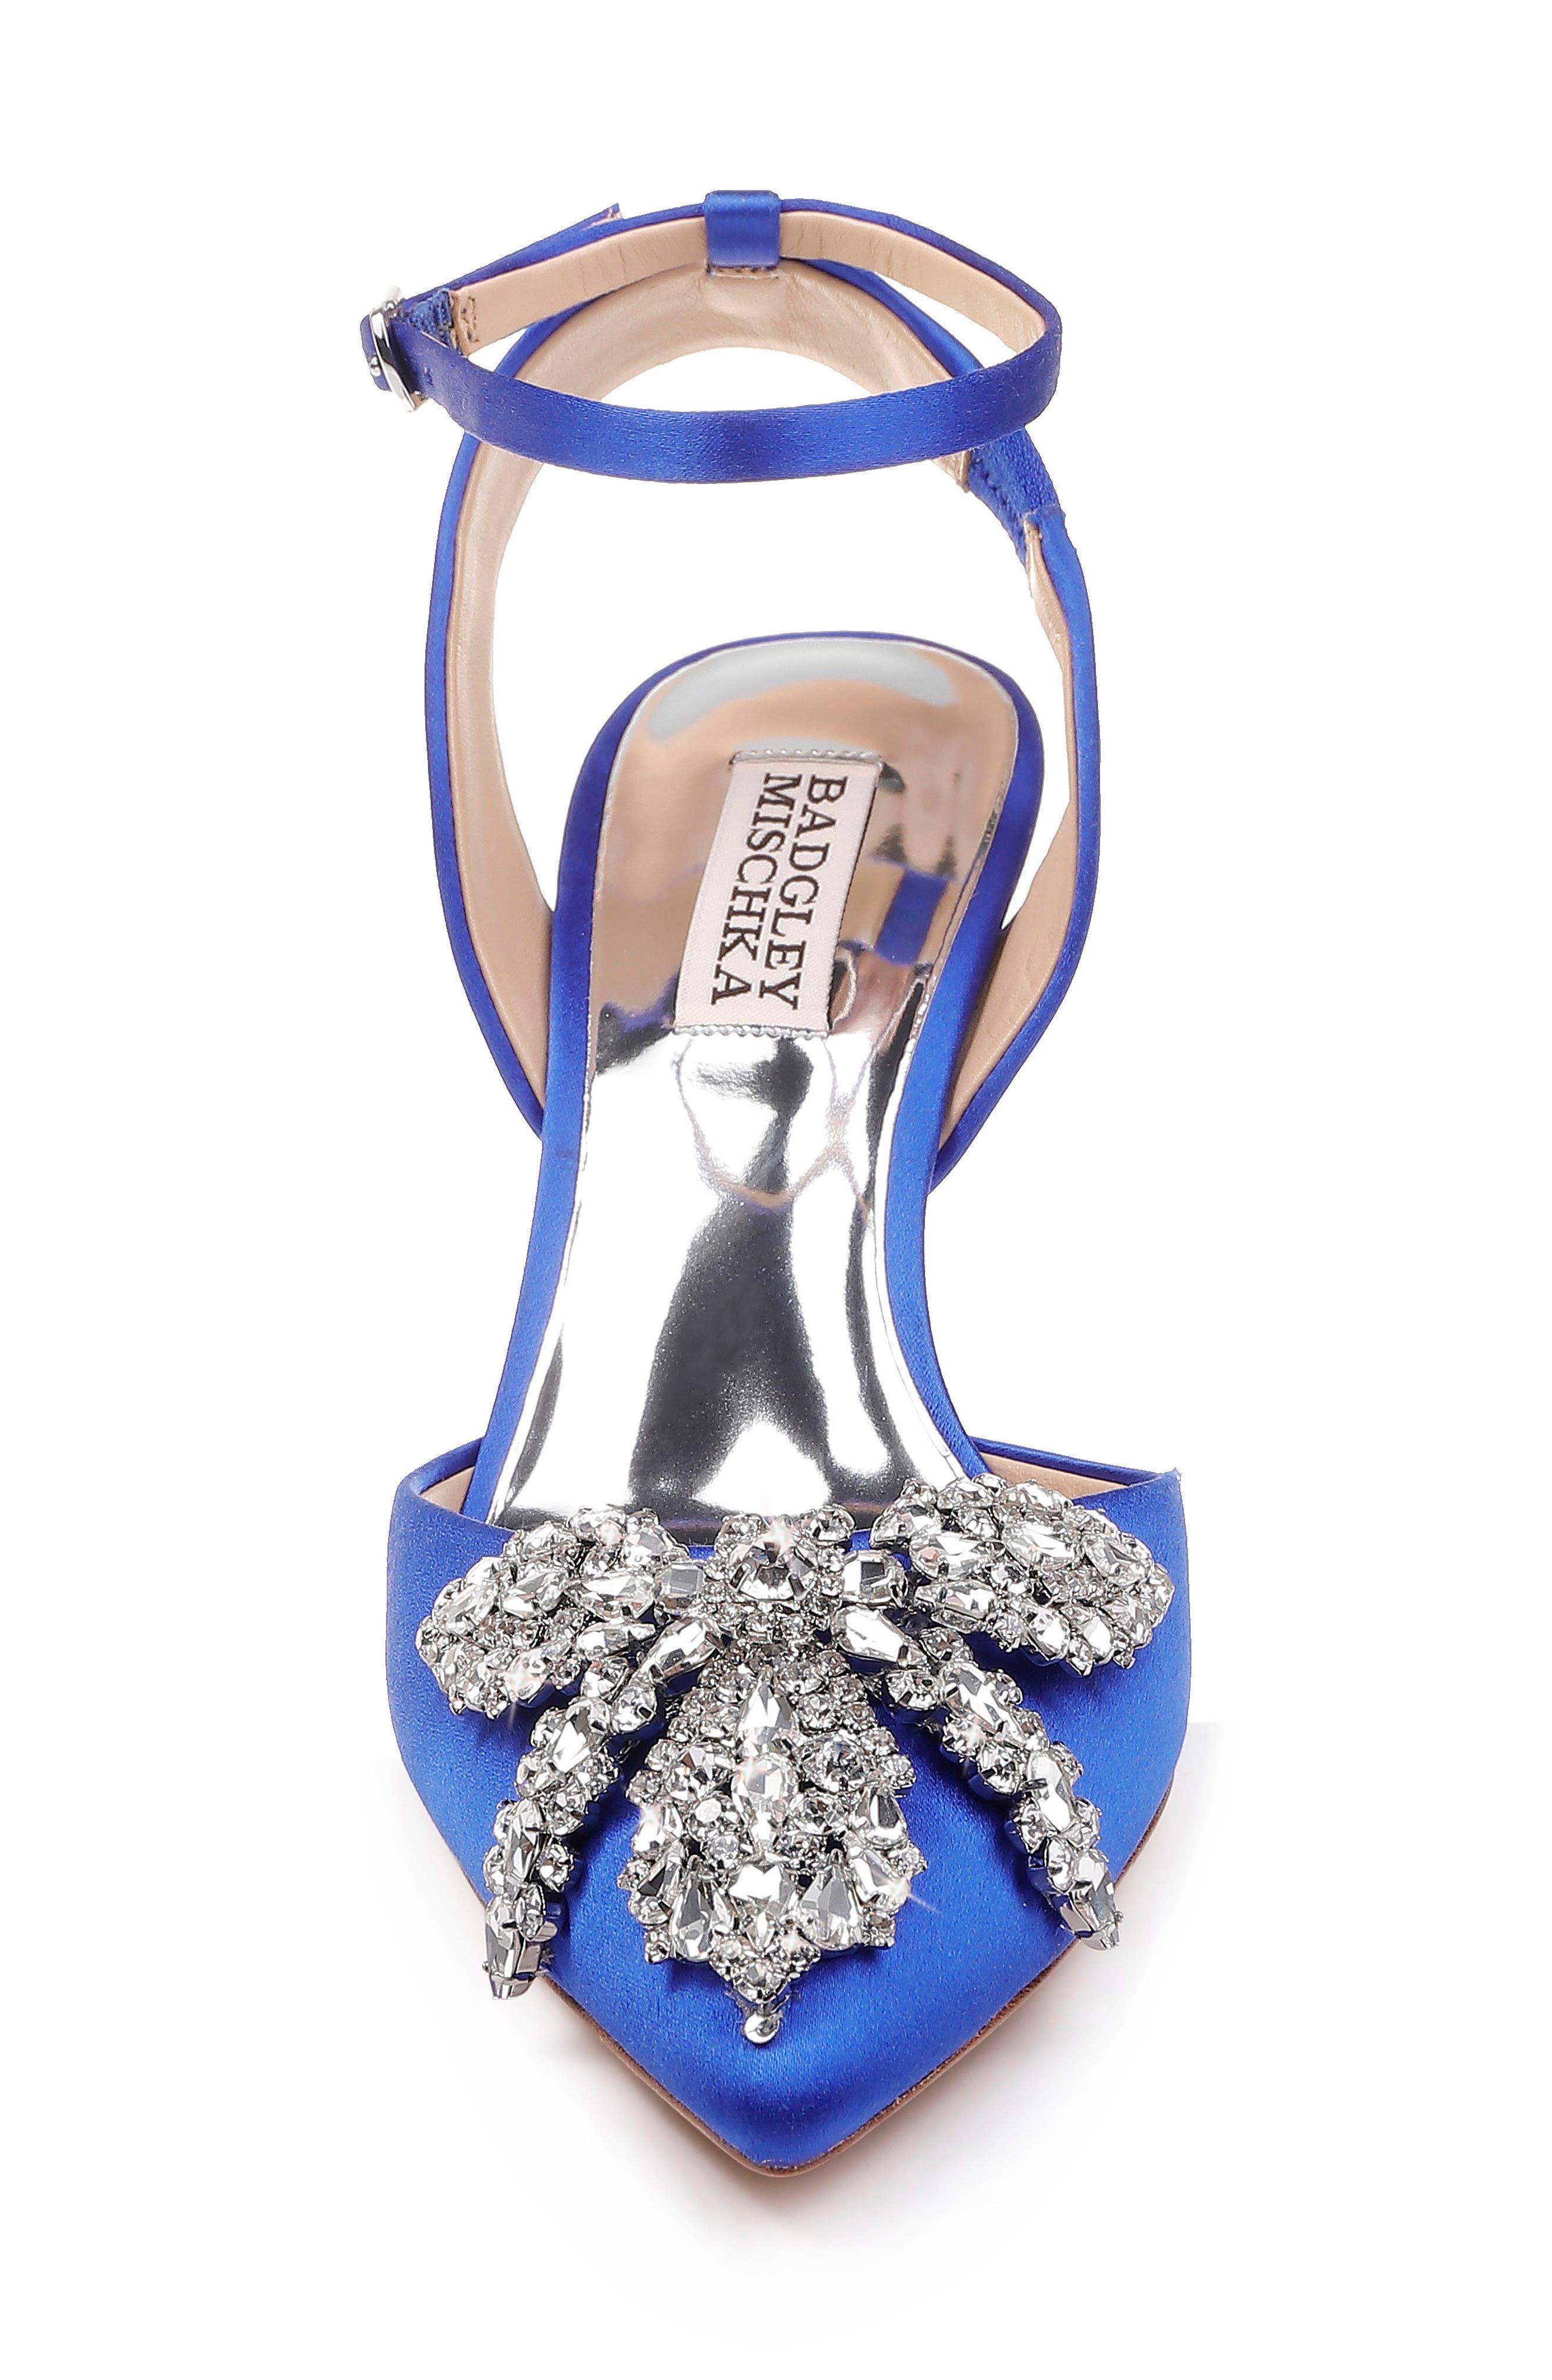 BADGLEY MISCHKA COLLECTION,                             Badgley Mischka Fana Crystal Embellished Pump,                             Alternate thumbnail 4, color,                             AFRICAN BLUE SATIN